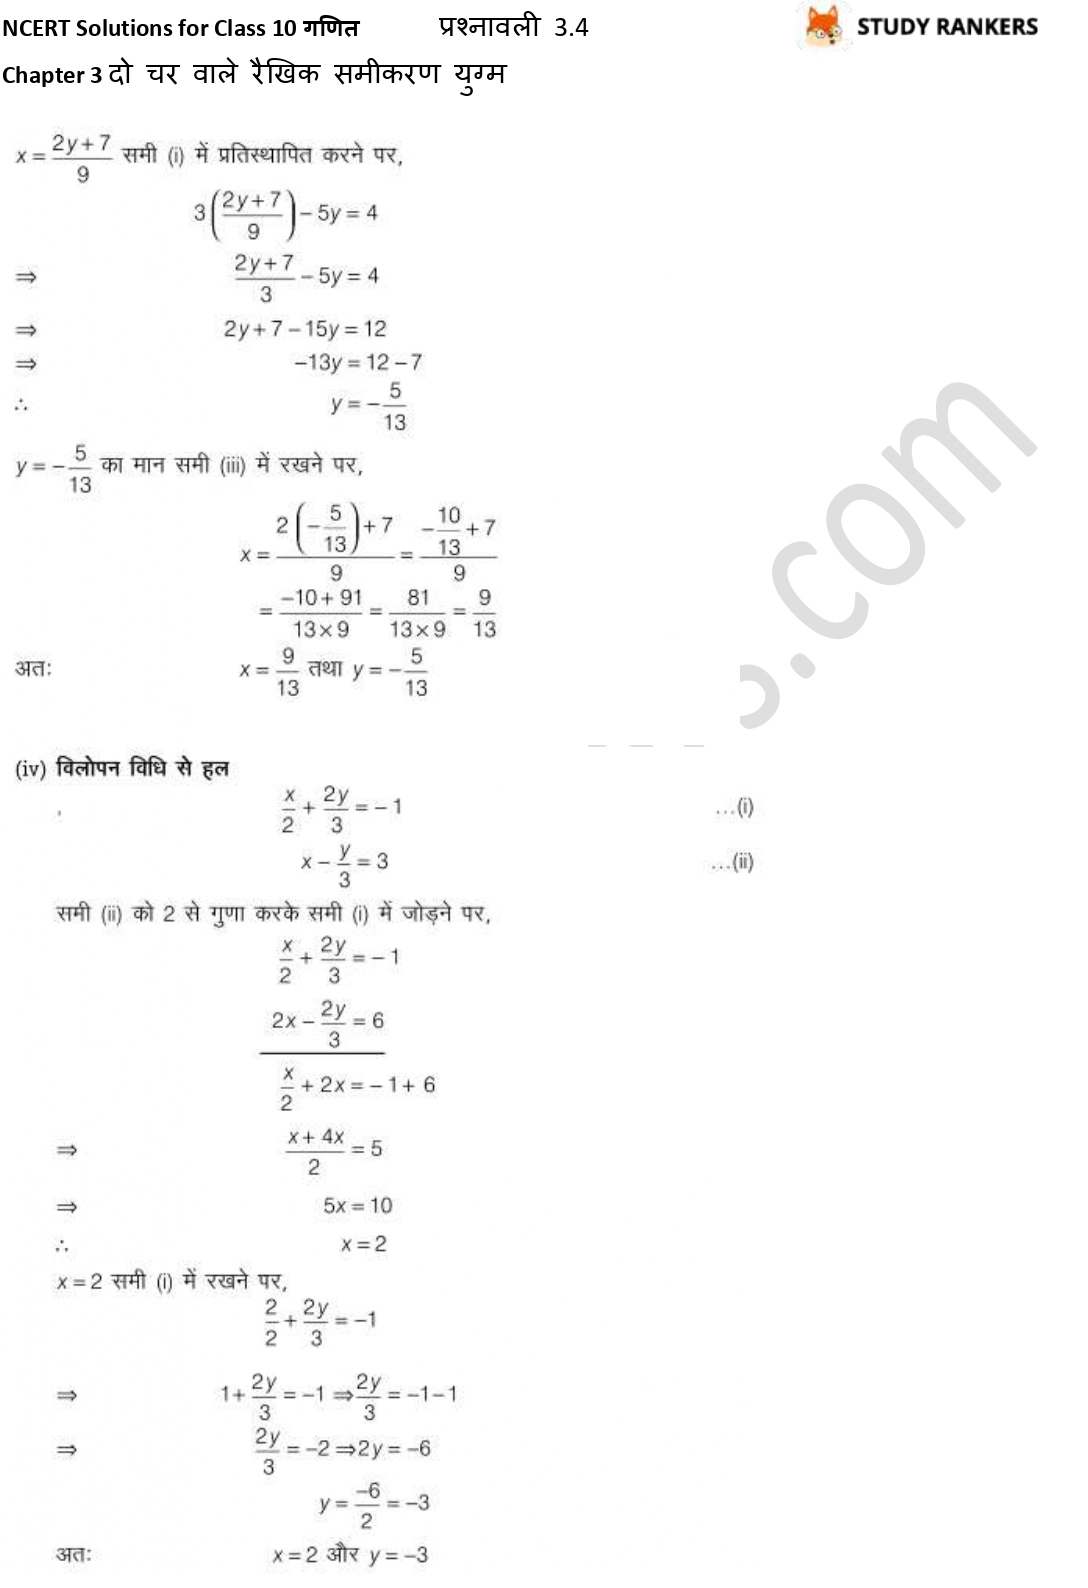 NCERT Solutions for Class 10 Maths Chapter 3 दो चर वाले रैखिक समीकरण युग्म प्रश्नावली 3.4 Part 5